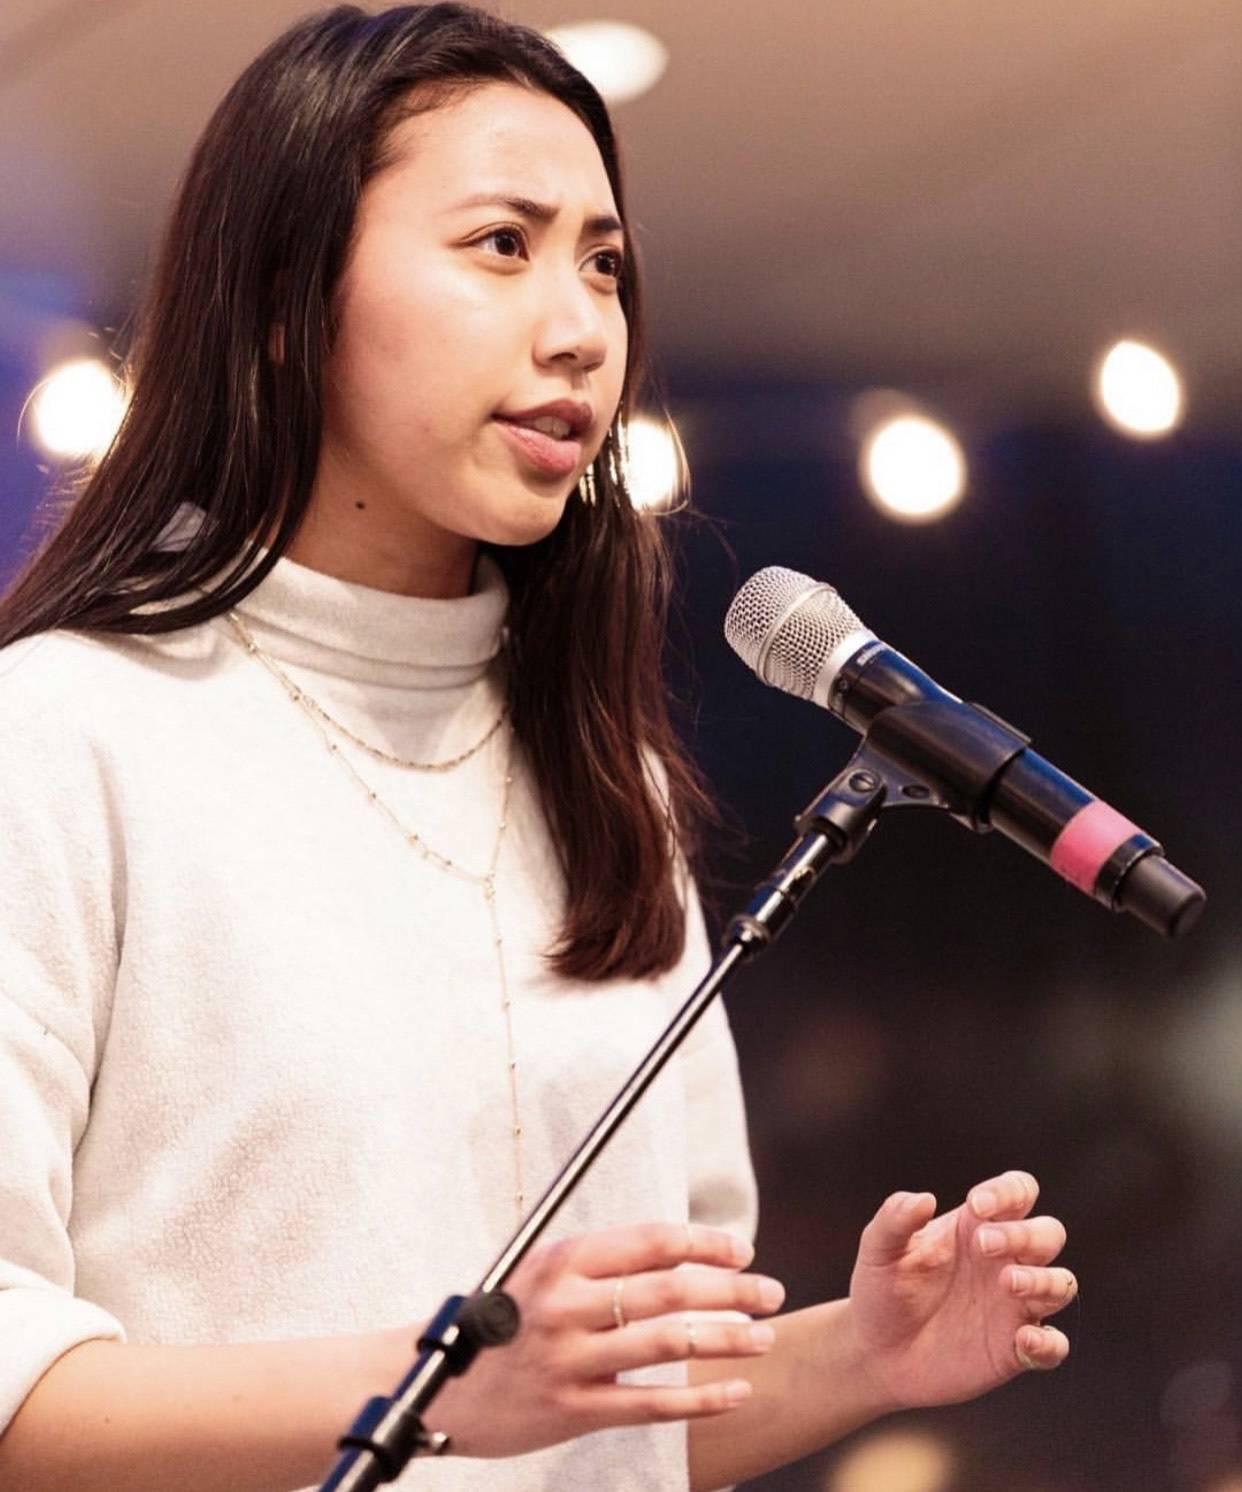 Dena Igusti with a microphone